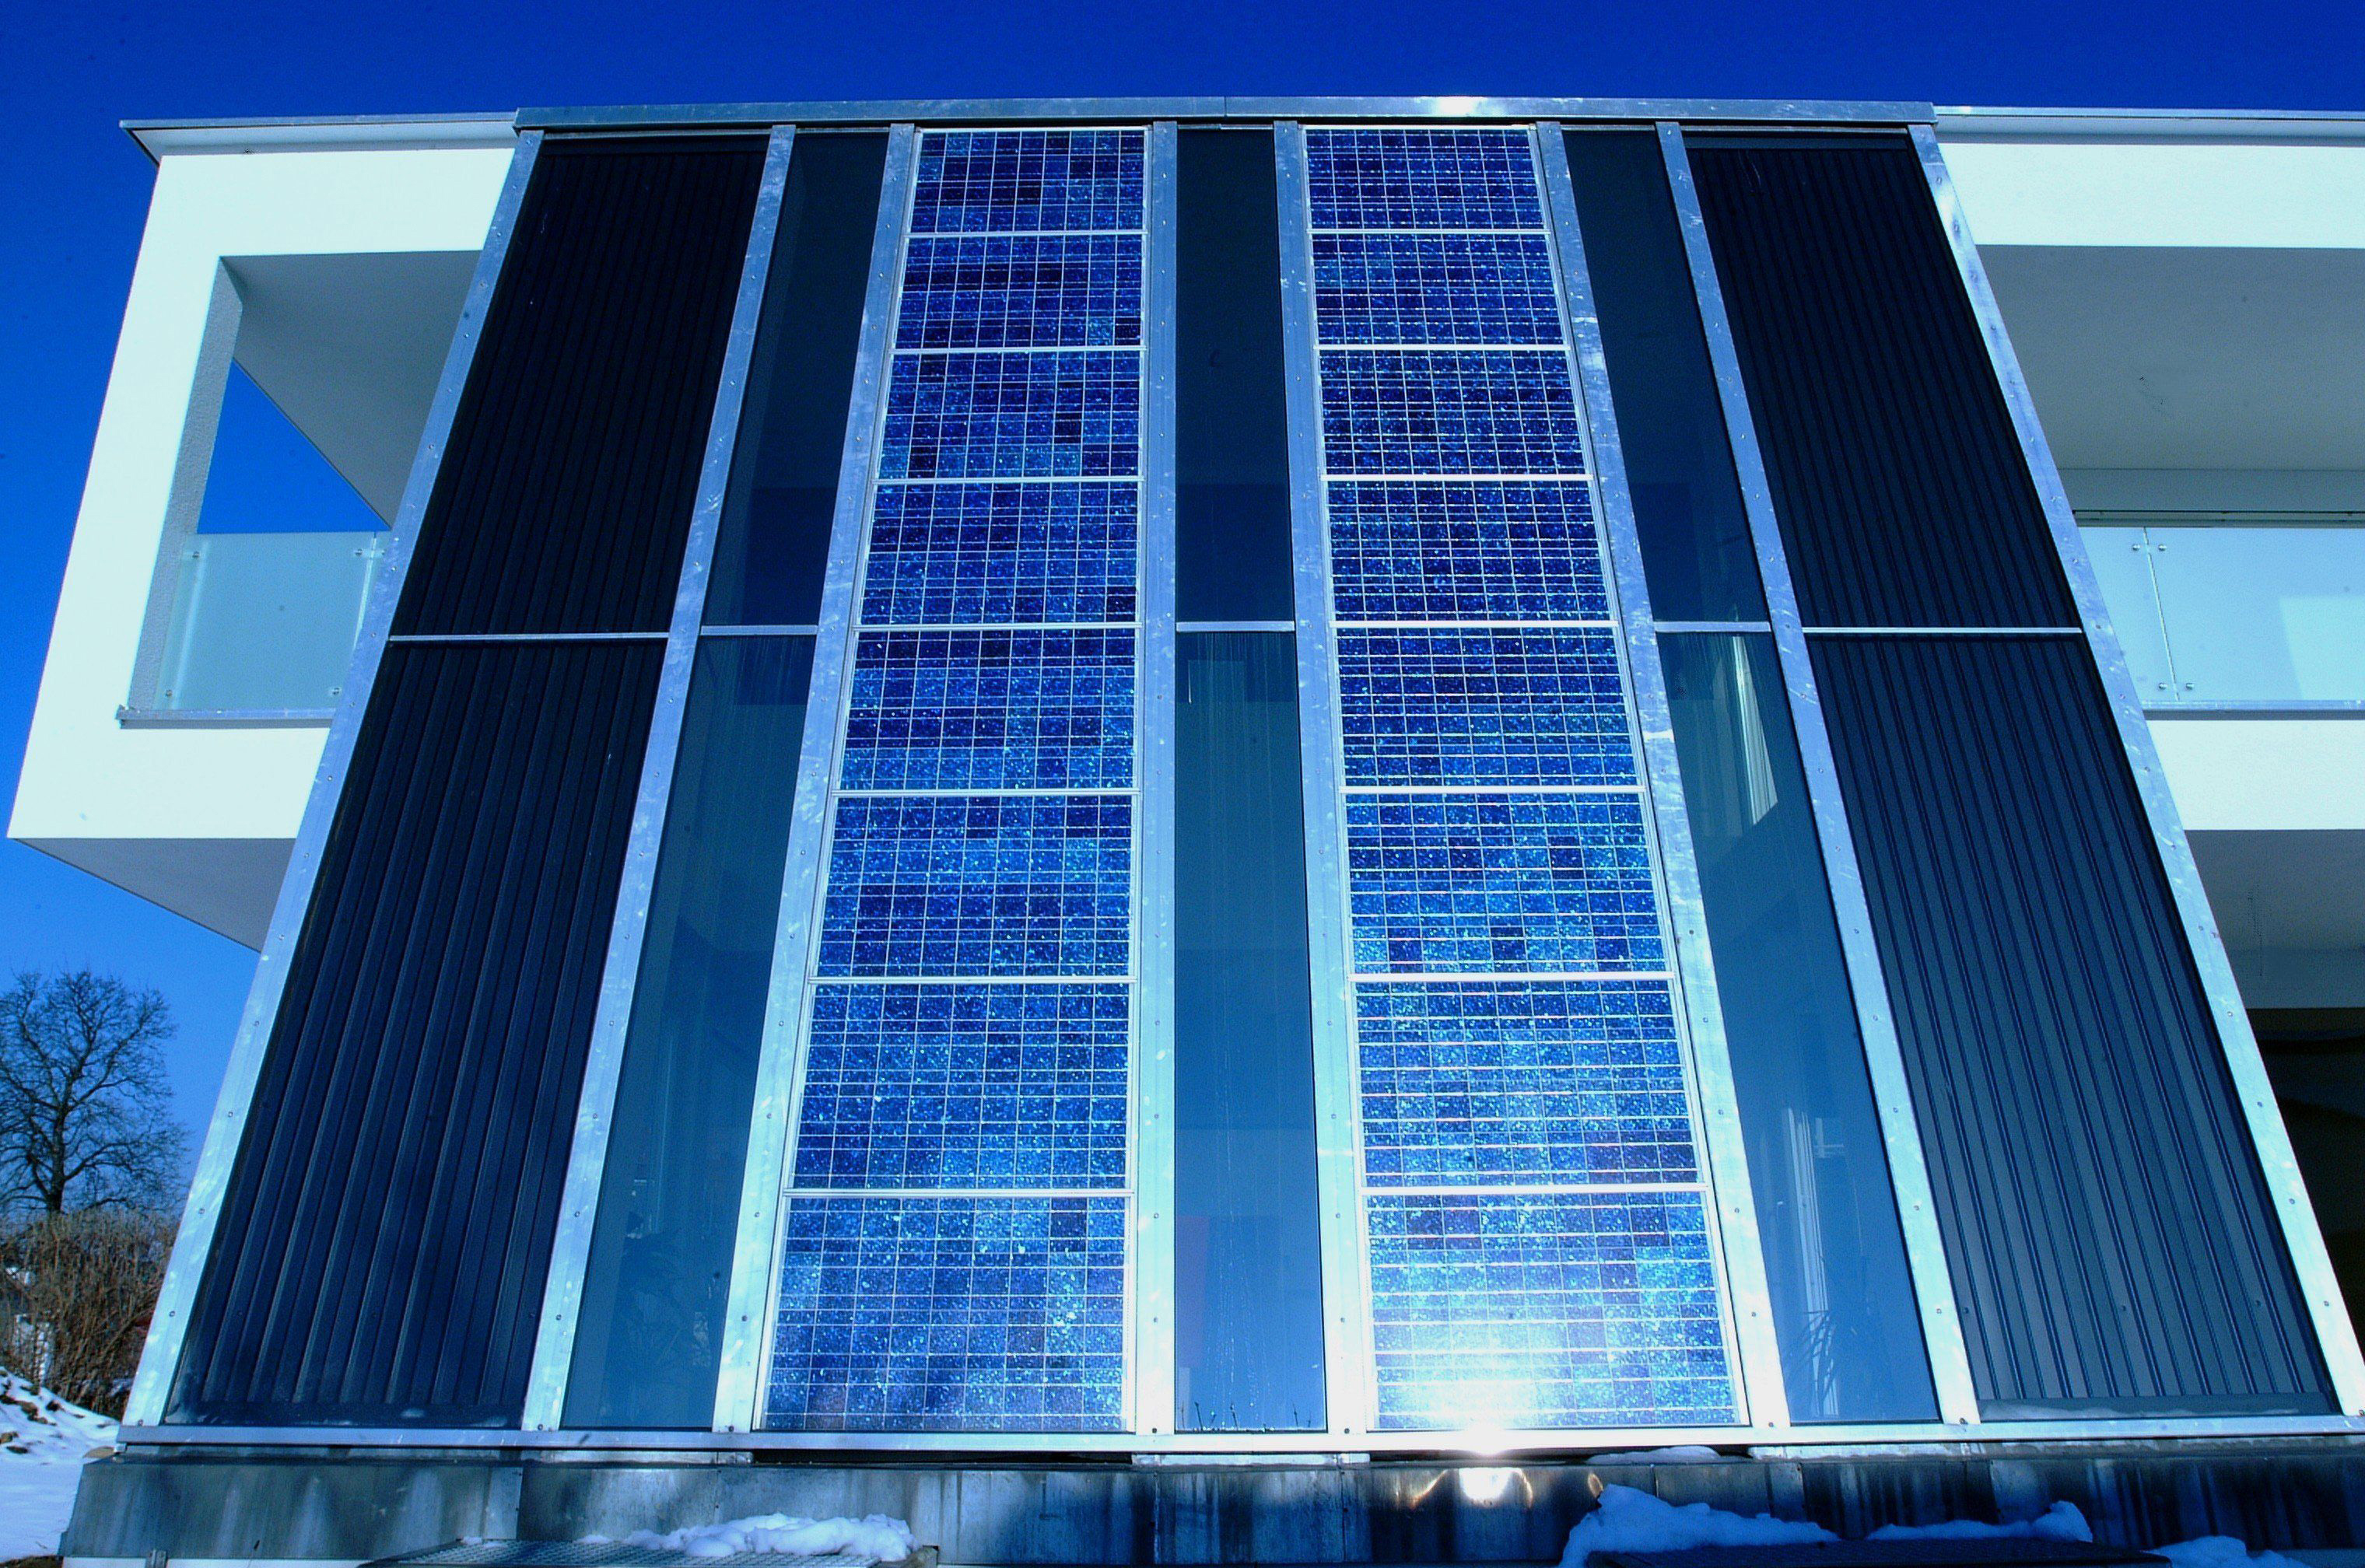 Fassade Meusburger Vorarlberg, © Christine Kees, stromaufwärts Photovoltaik GmbH